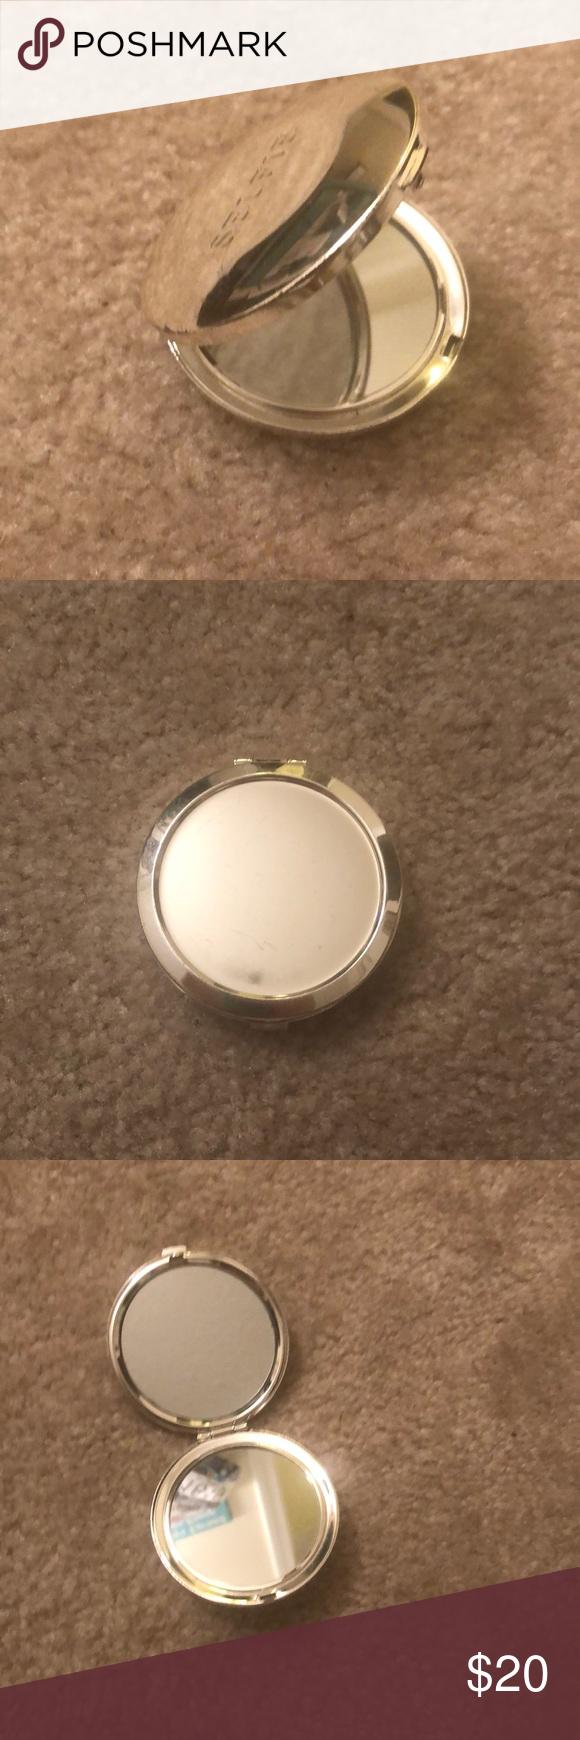 """SELFIE"" Travel Mirror This mirror hasn't been used. It's"